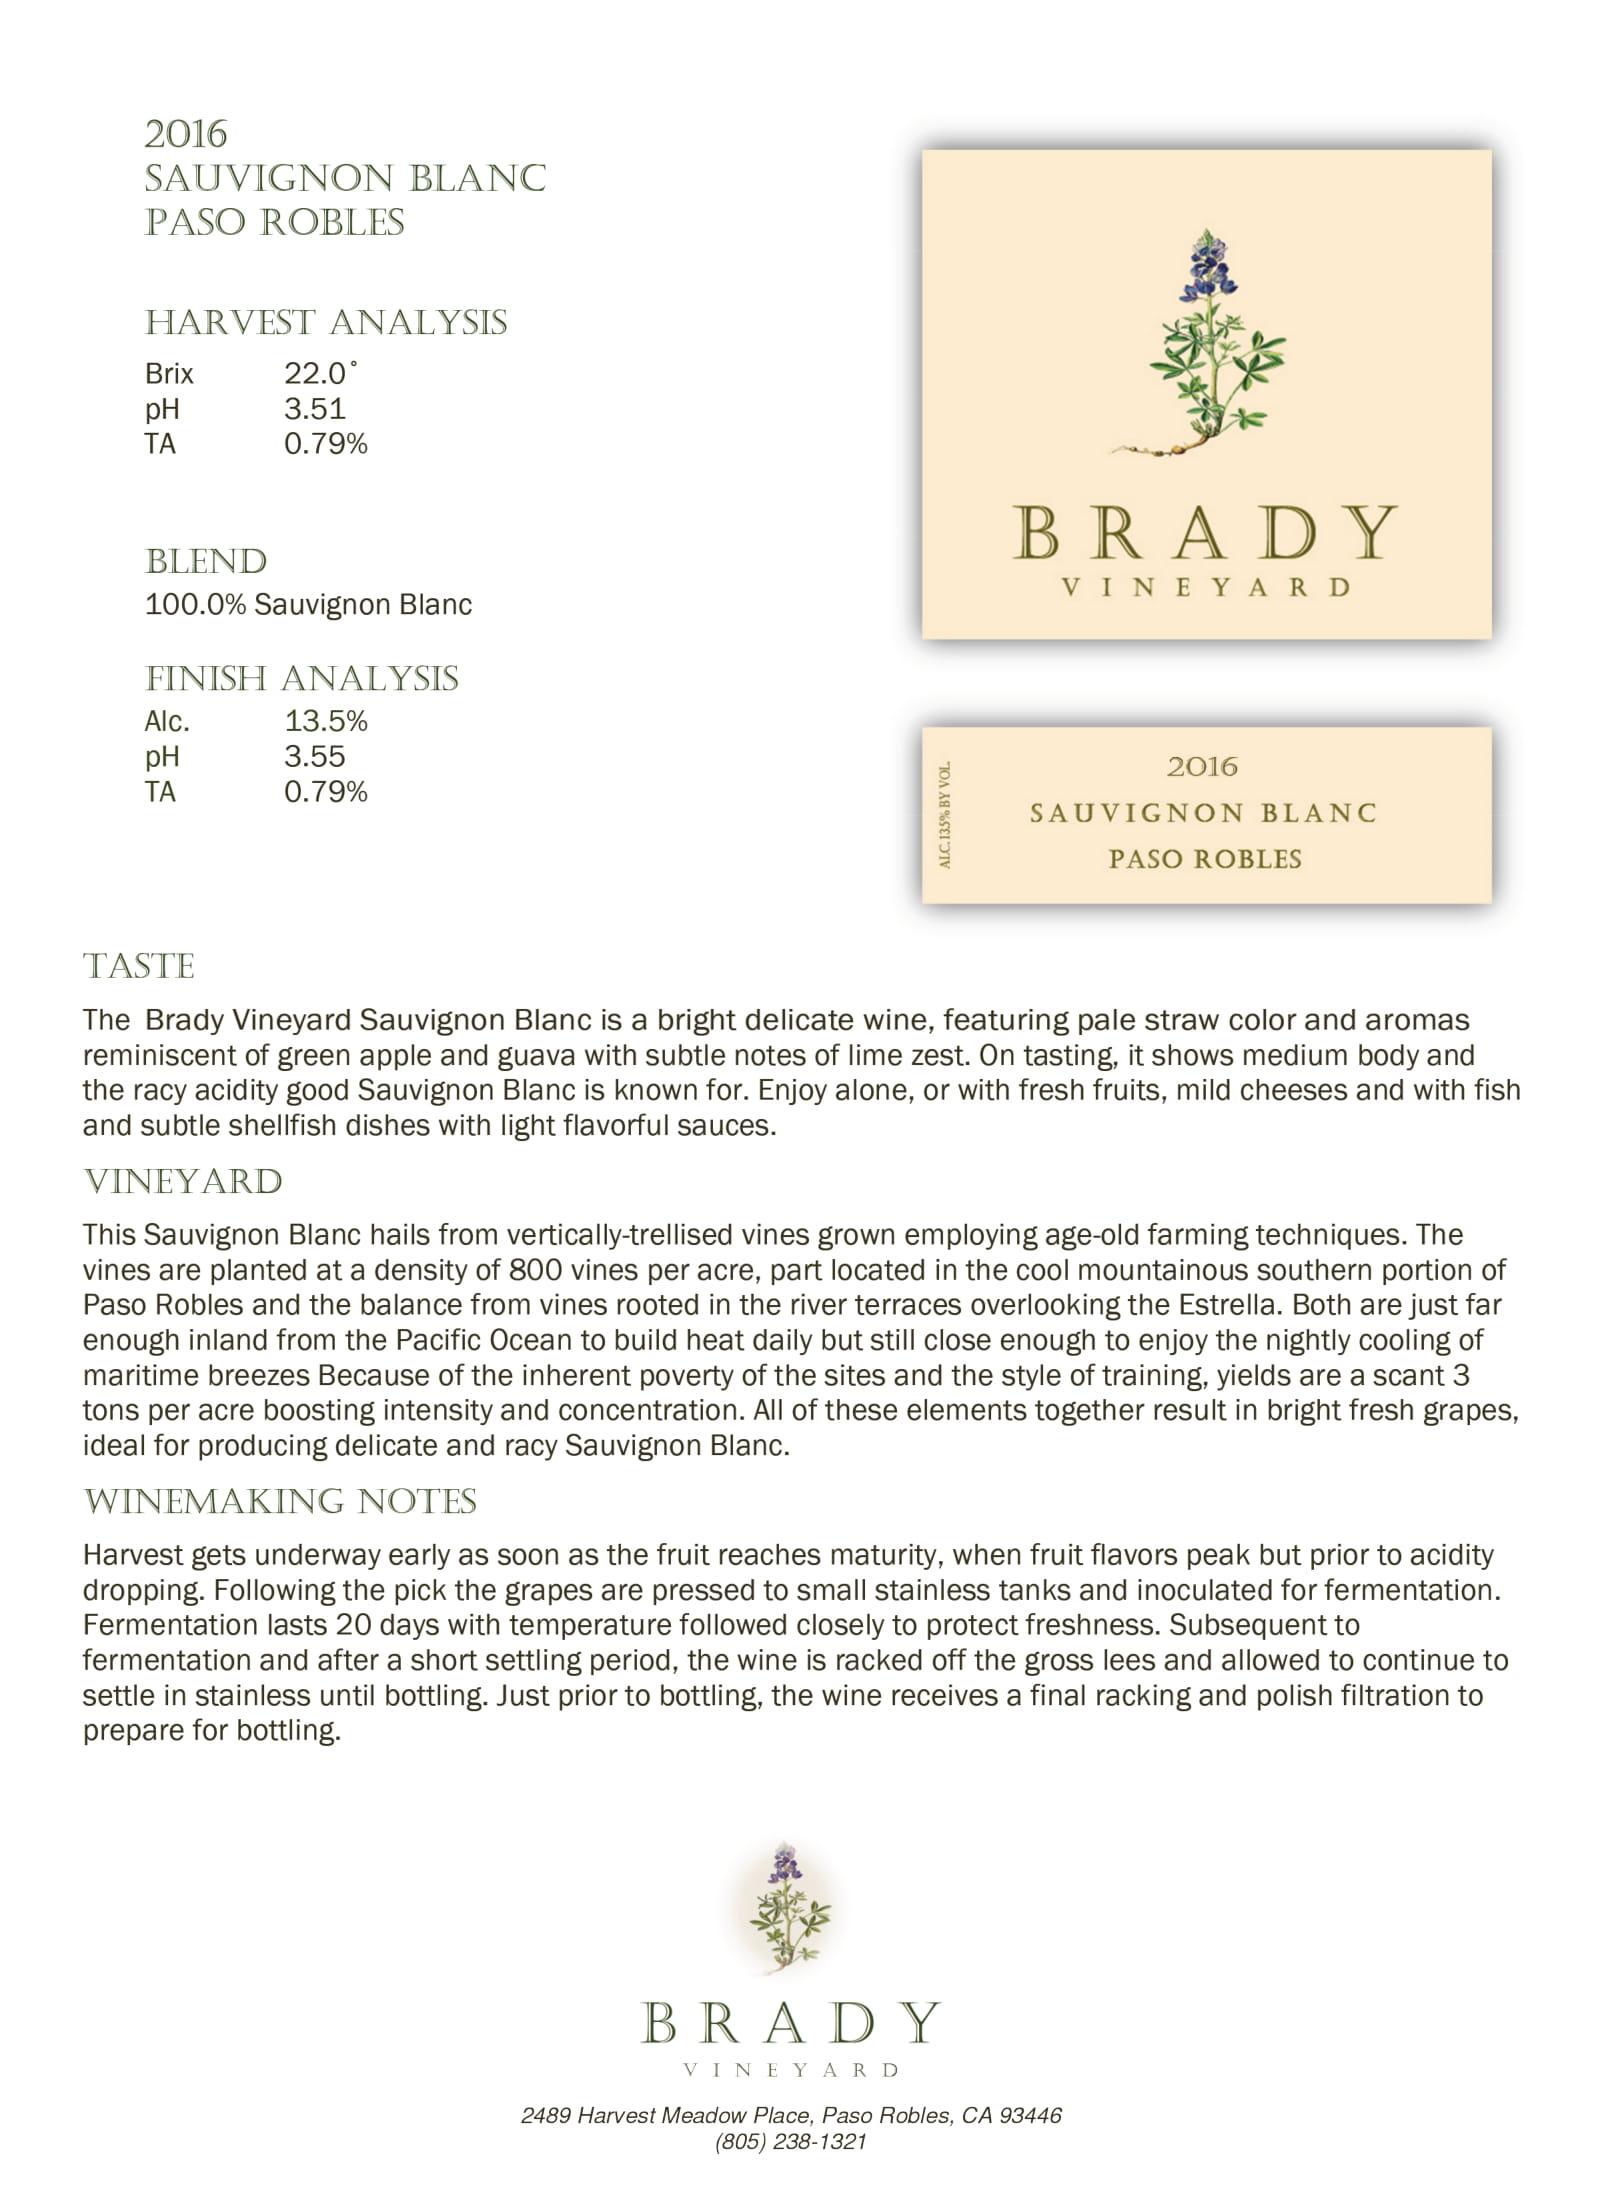 Brady Vineyards Sauvignon Blanc Sell Sheet